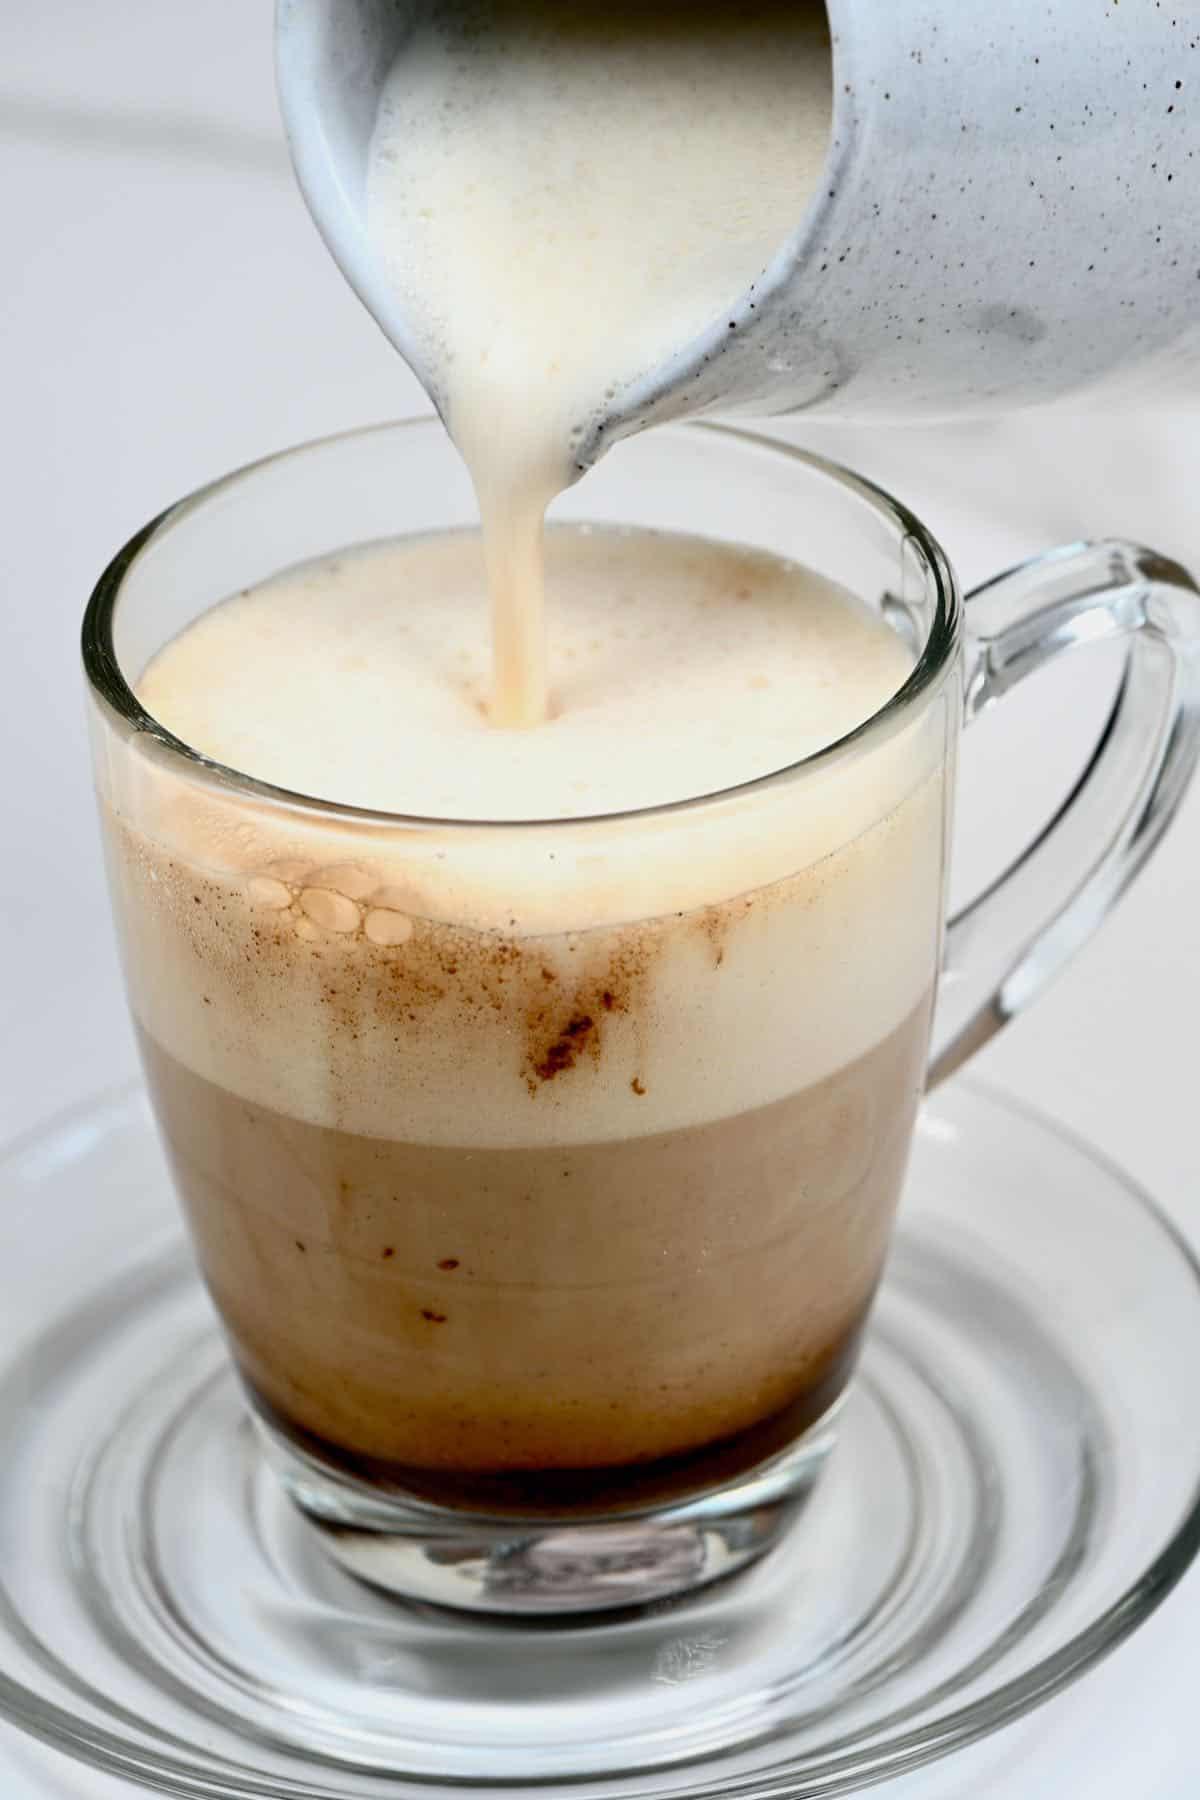 Adding milk for a mushroom latte